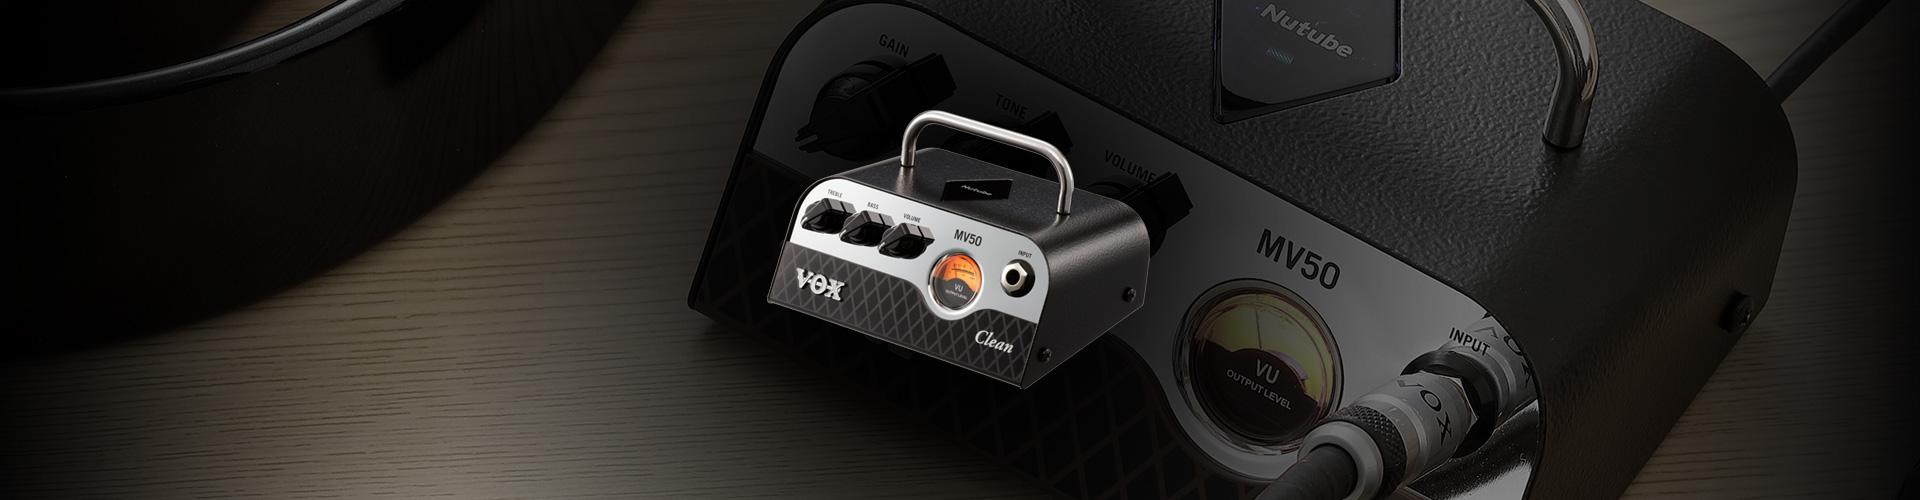 VOX MV50 clean guitar amp